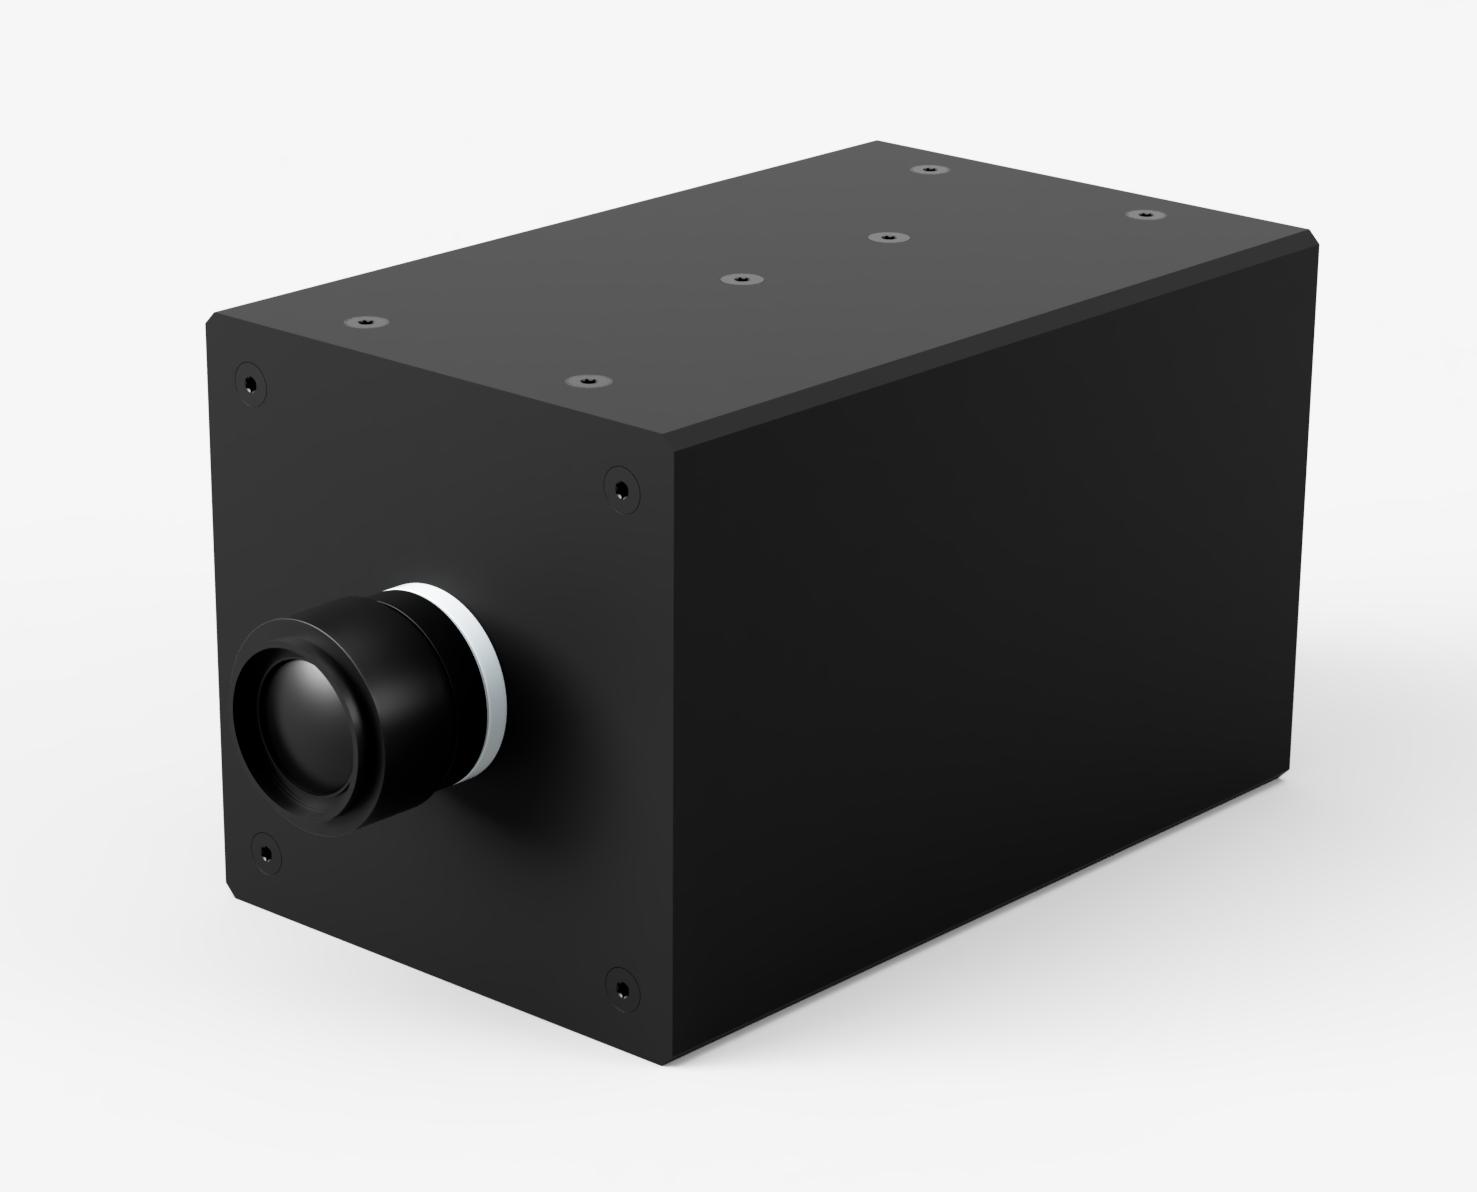 Industrial Hyperspectral Camera - BlackIndustry